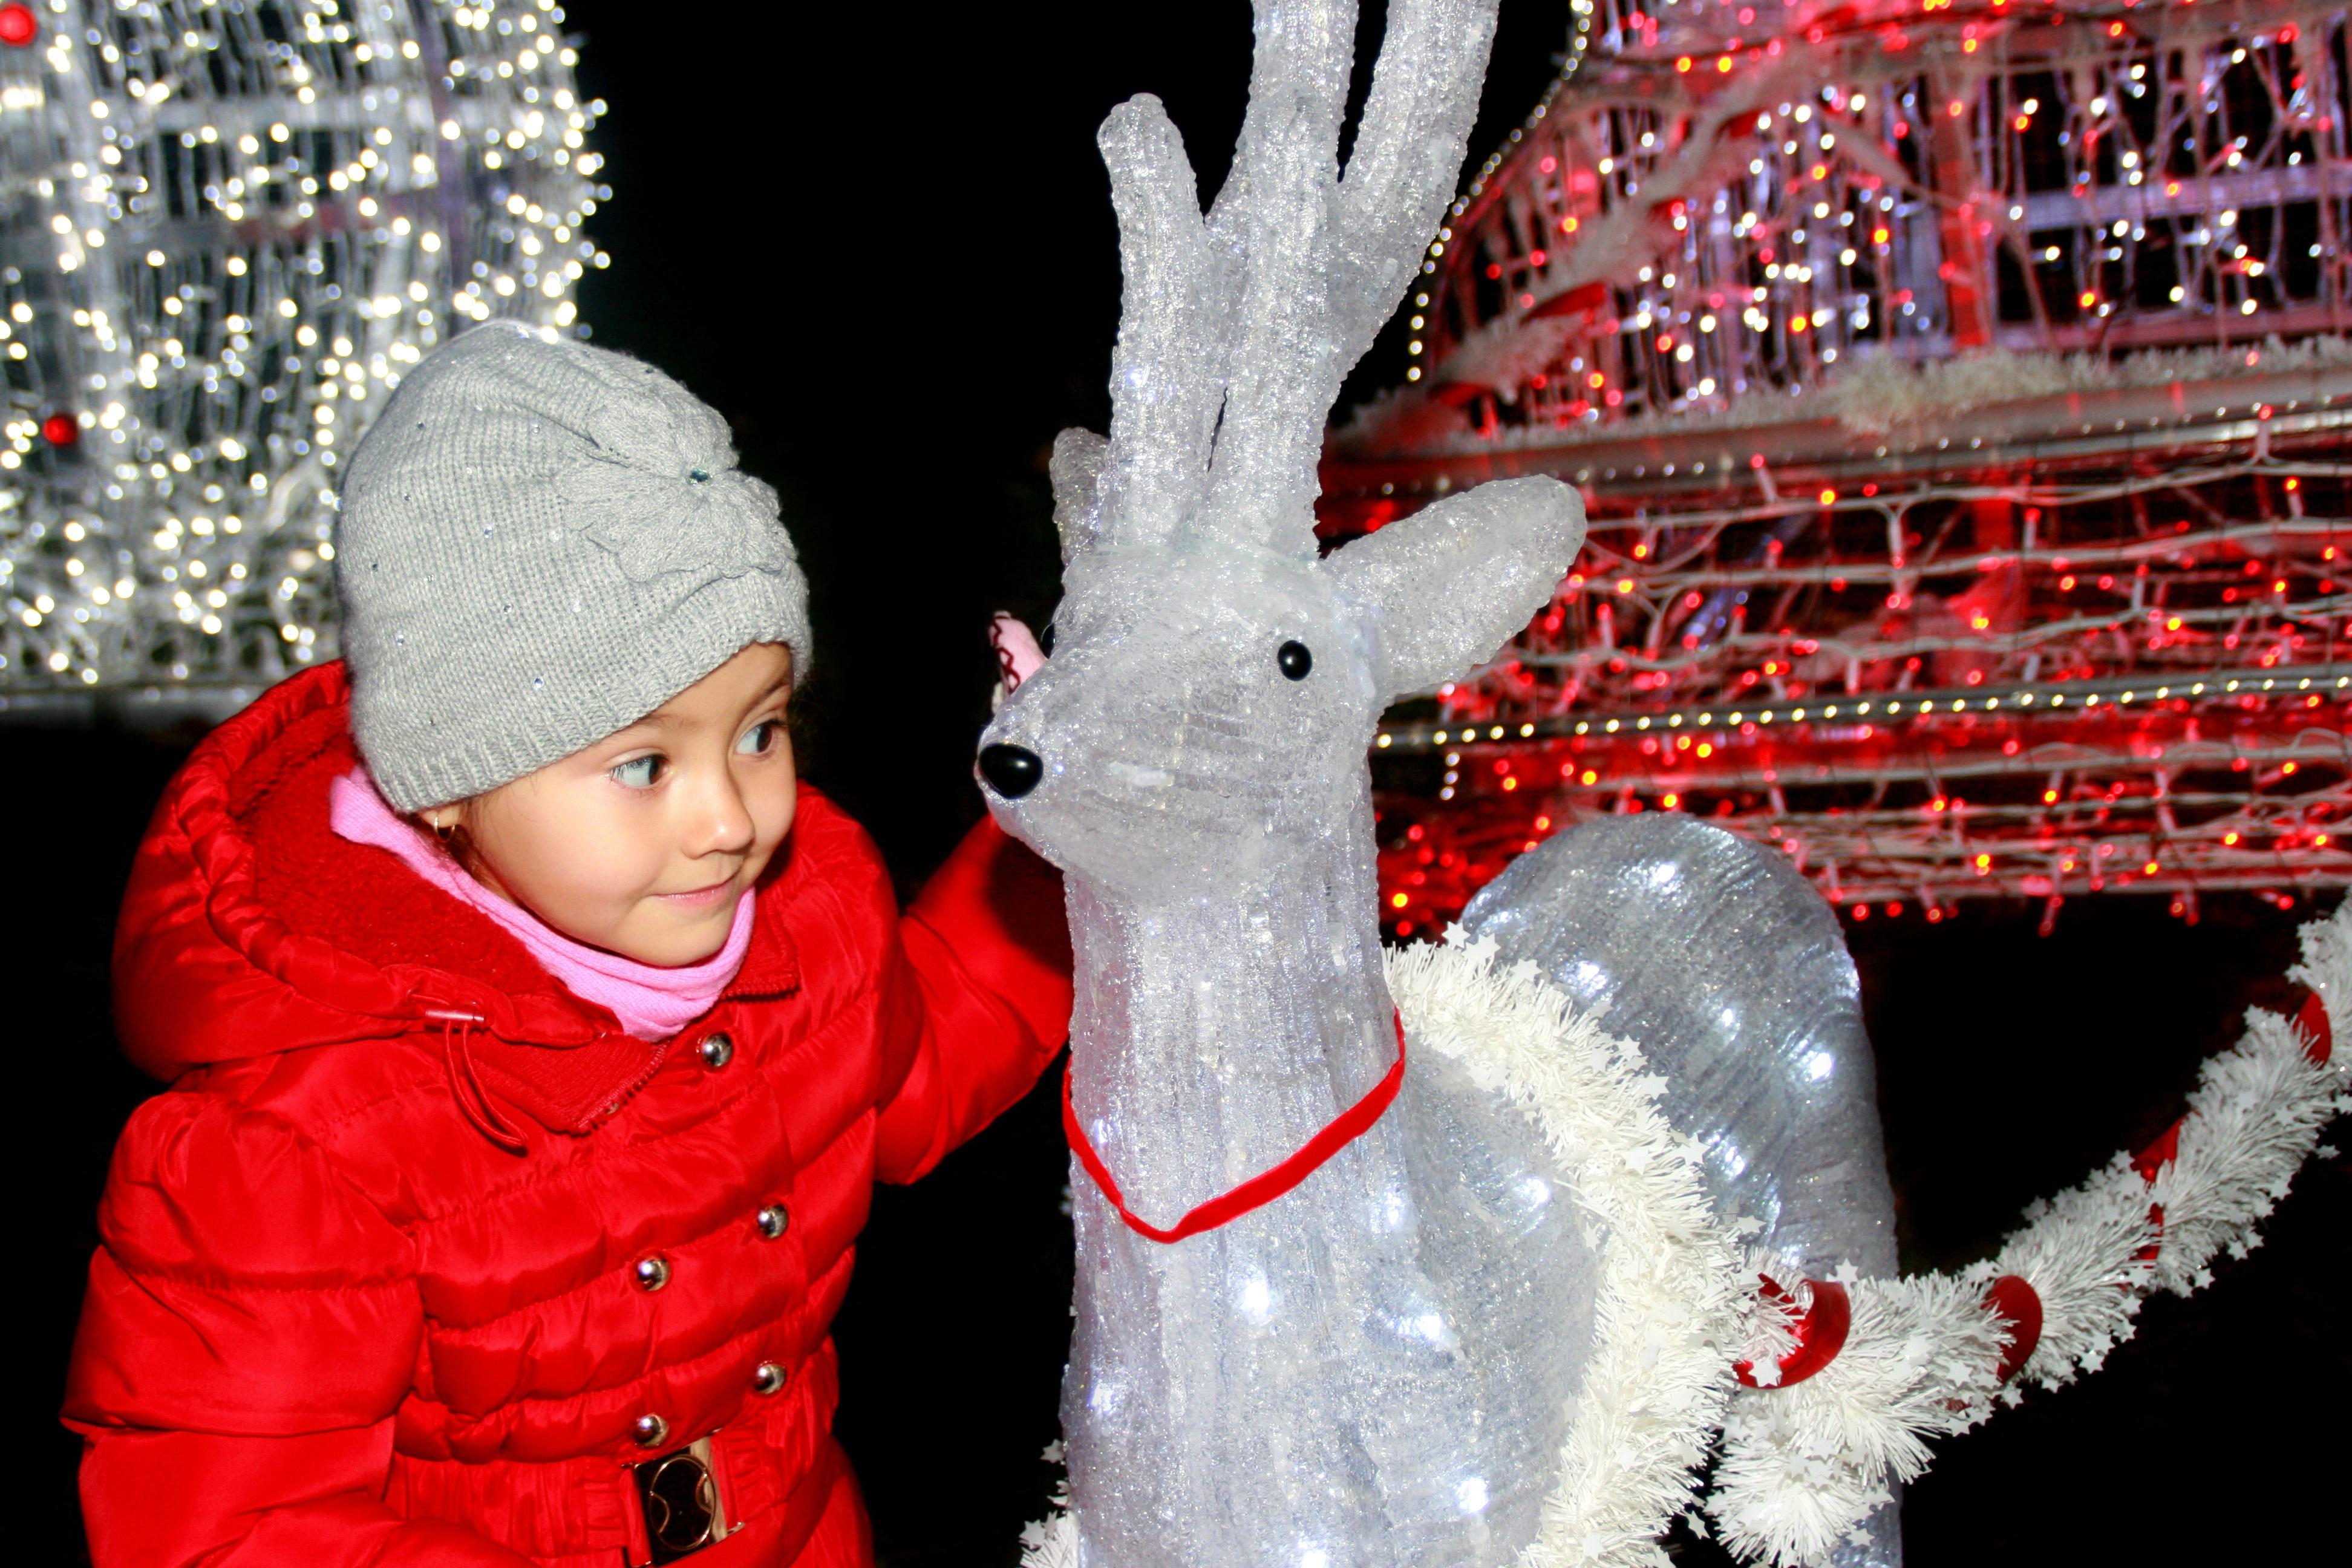 Christmas, Adorable, Child, Children, Girl, HQ Photo